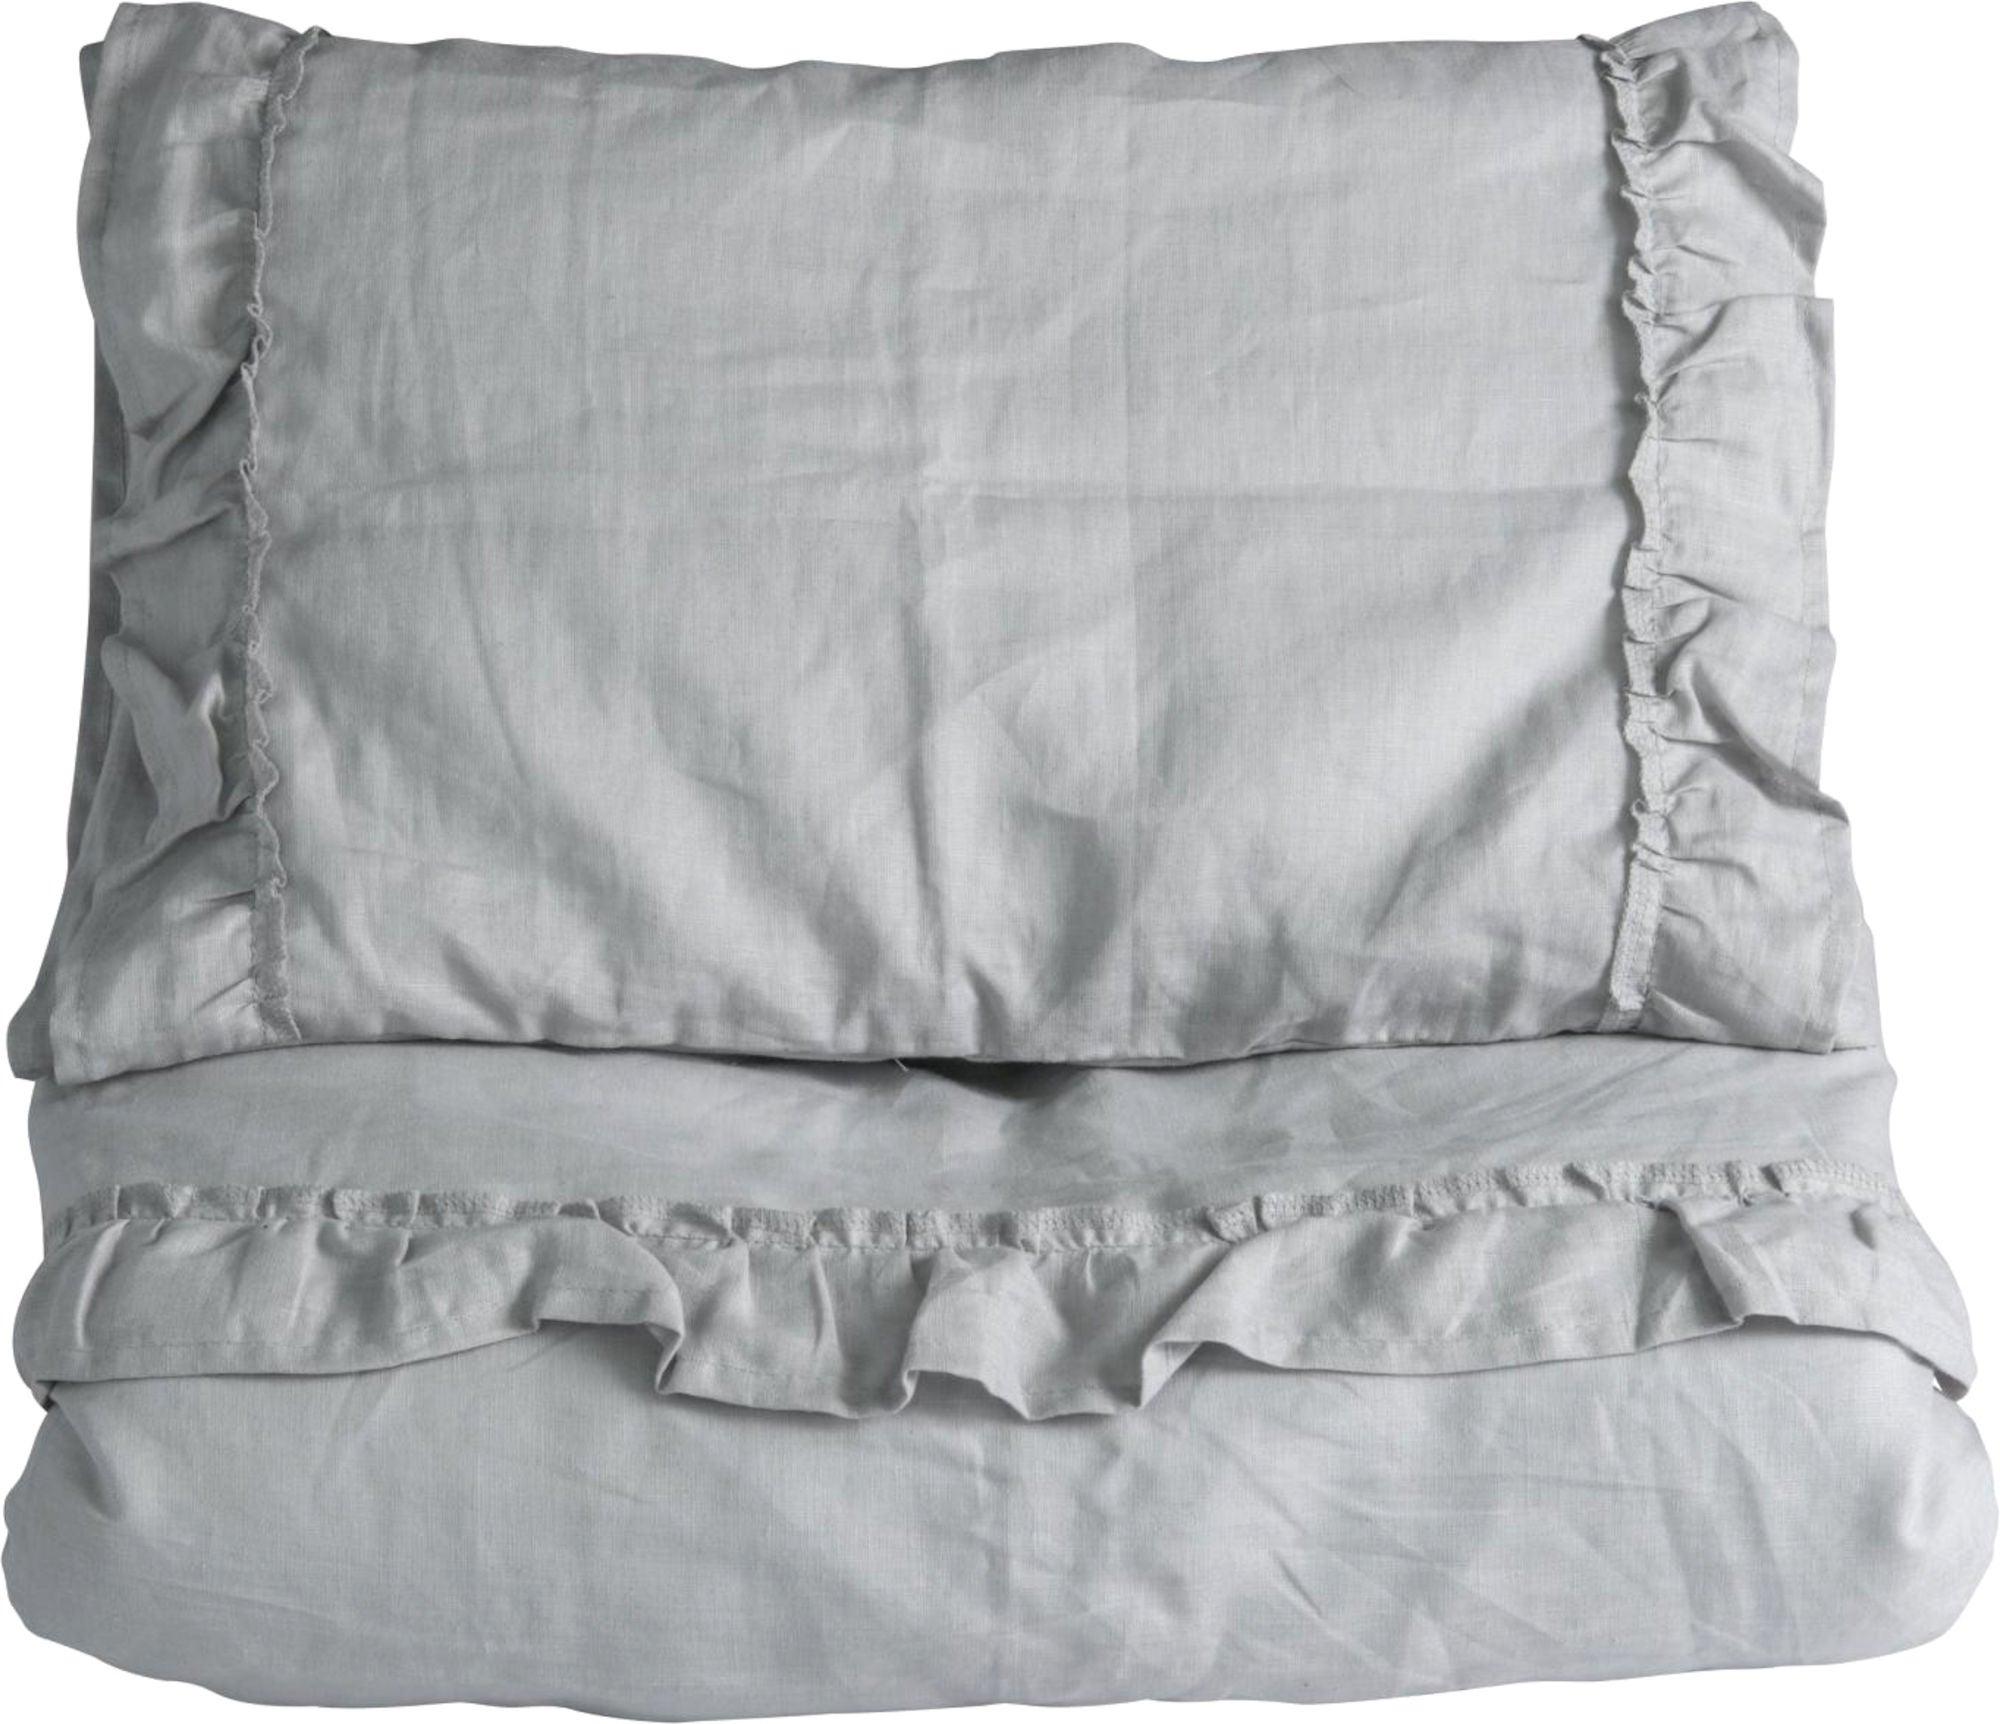 NG Baby Påslakanset 80x70 Mood Ruffles, Light Grey